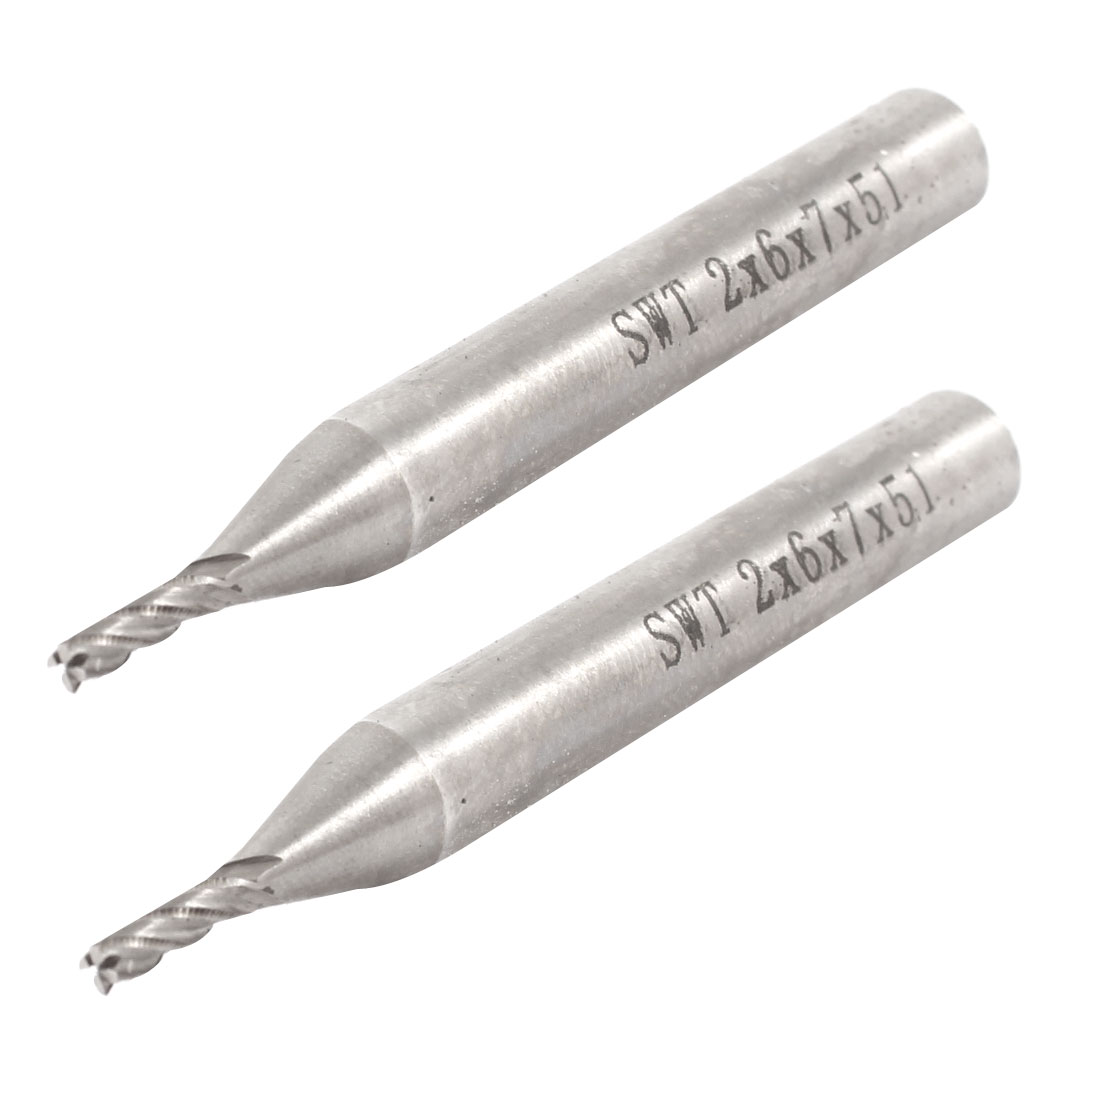 Straight Shank 2mmx6mmx7mmx51mm Cutting Milling Cutter 4 Flutes End Mill